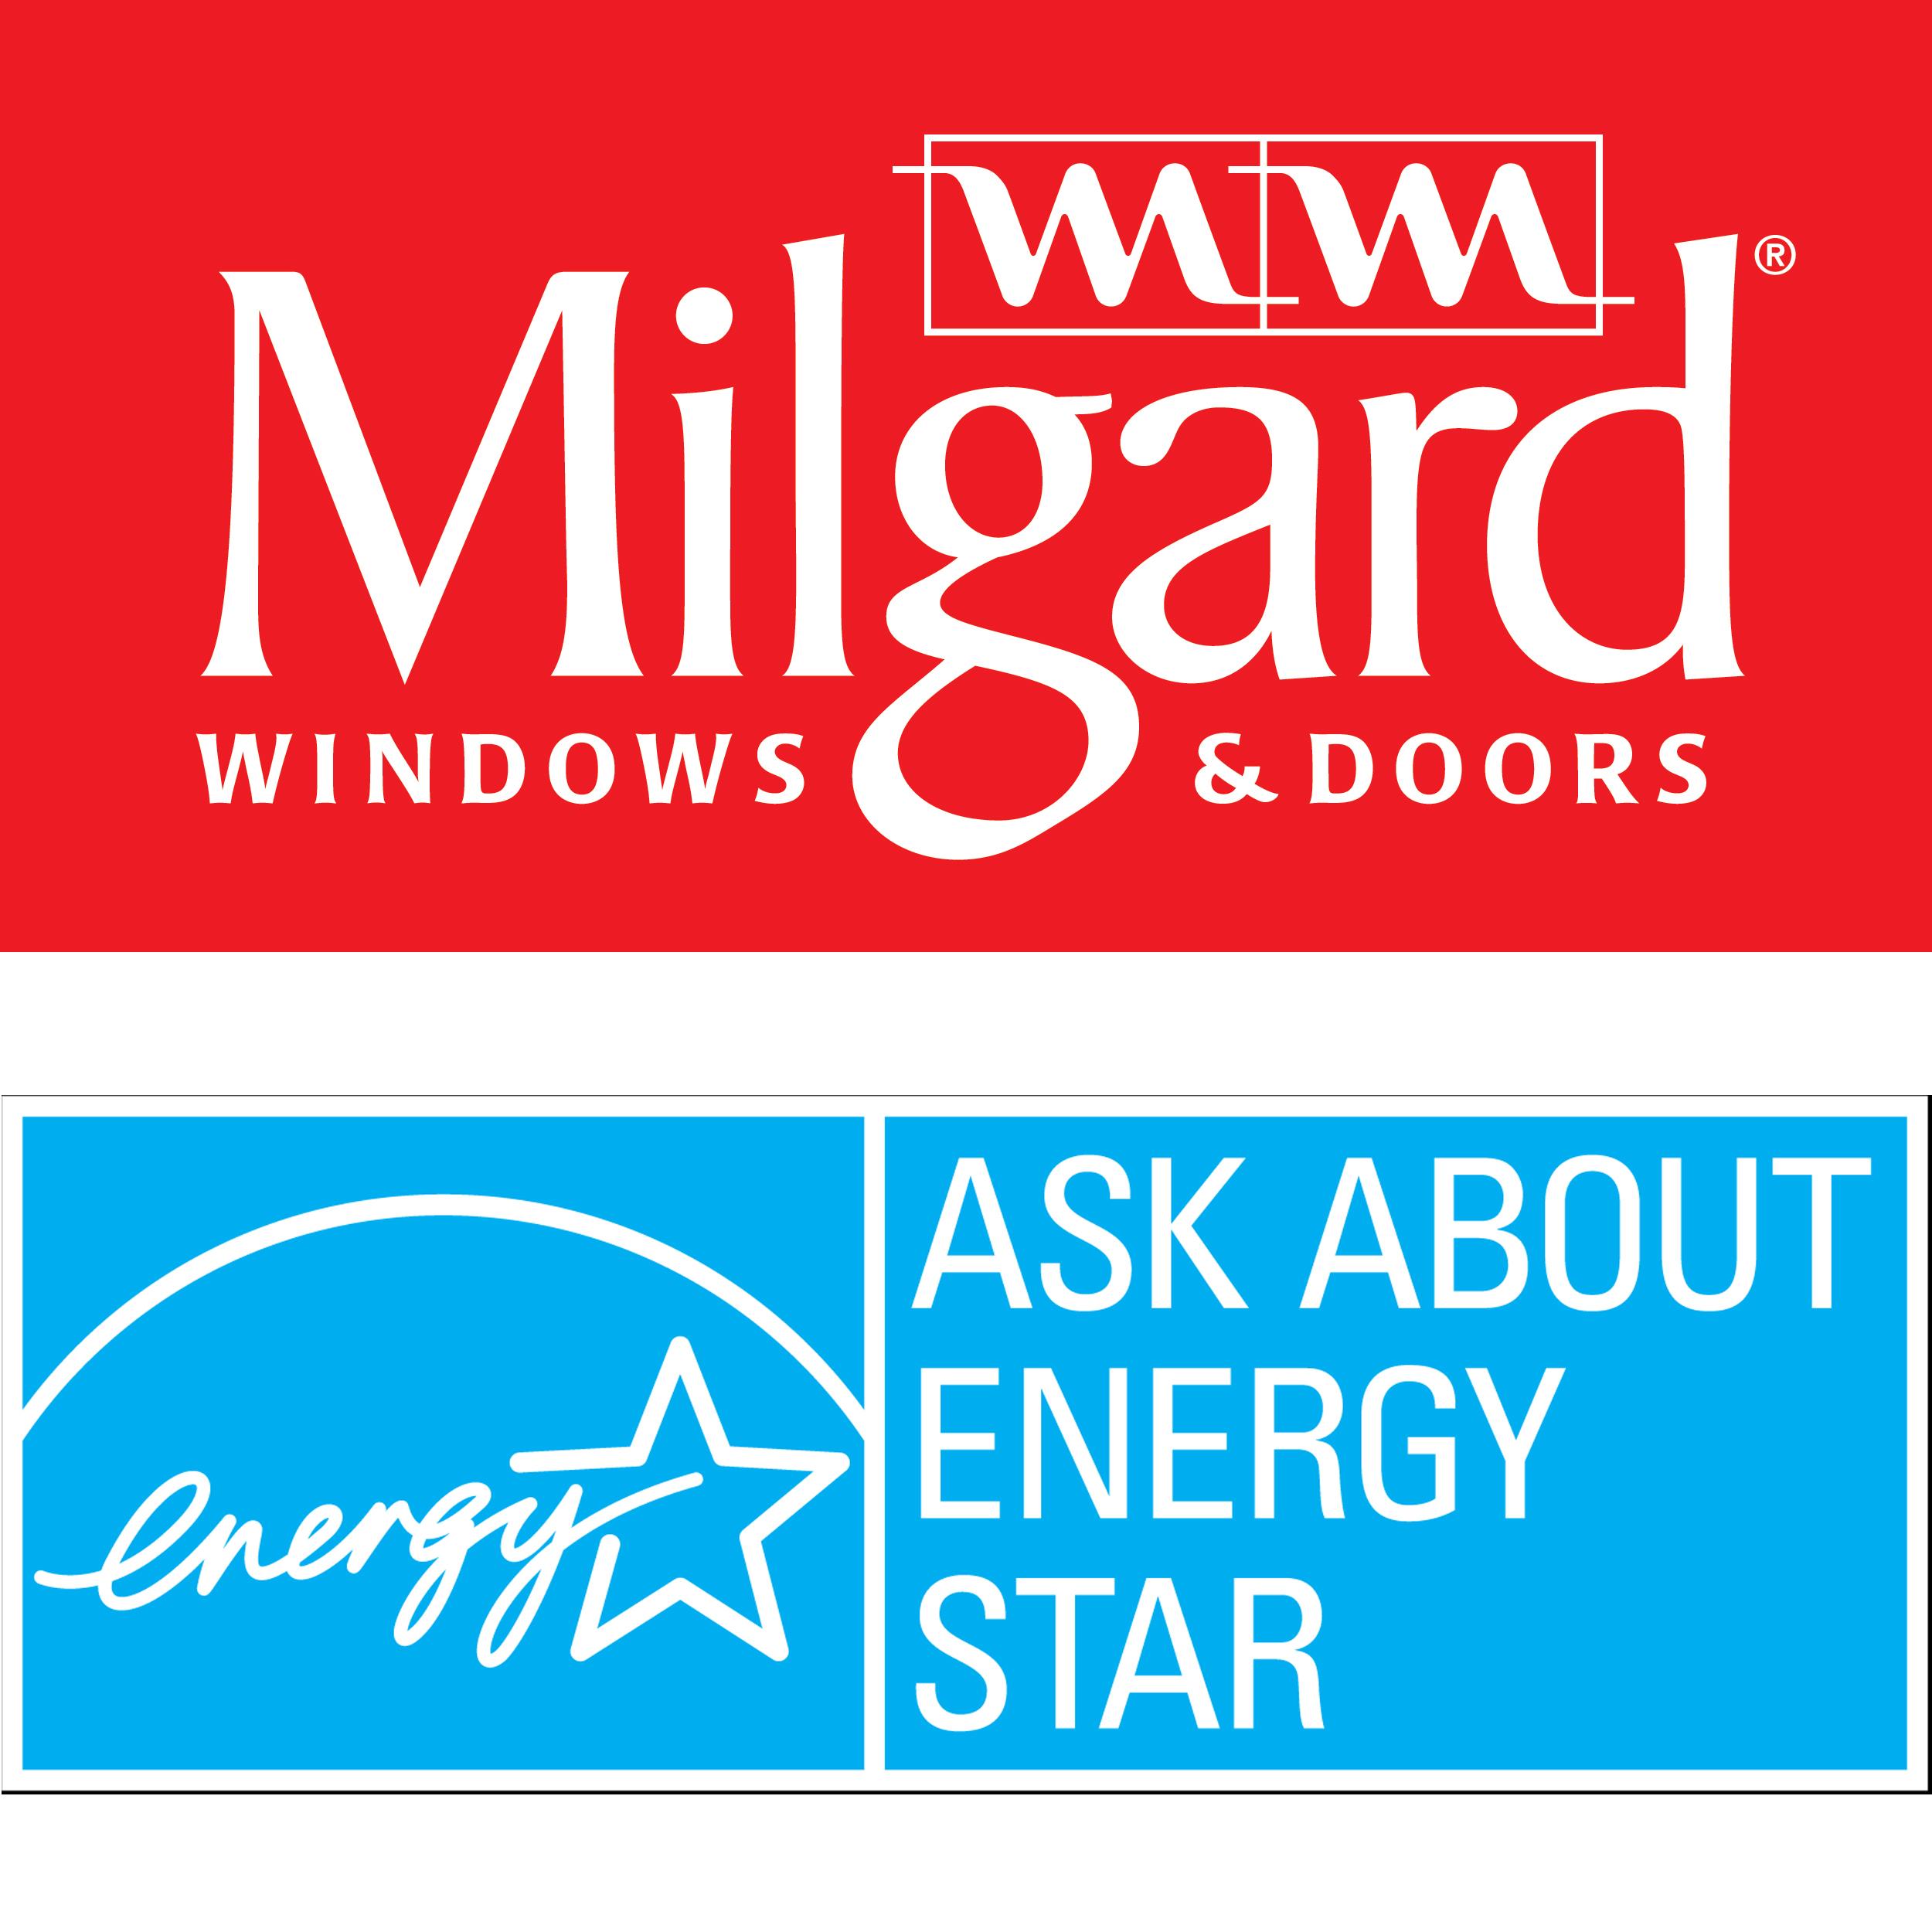 Energy Star Milgard.jpg